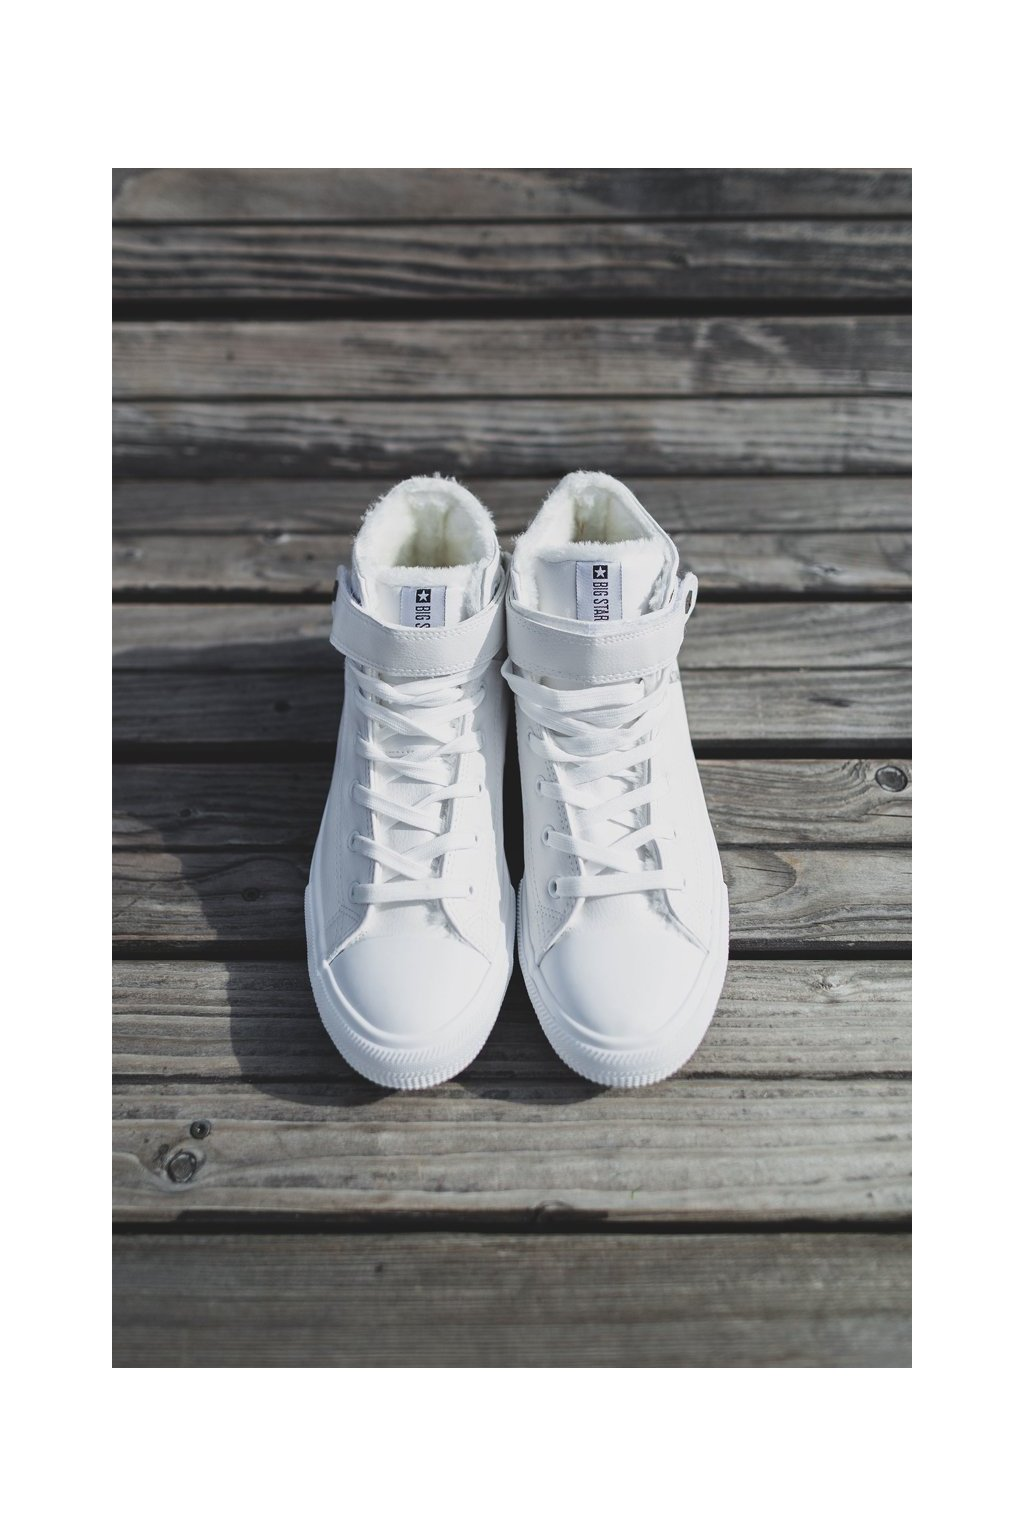 Biela obuv kód topánok Y174024FW WHITE